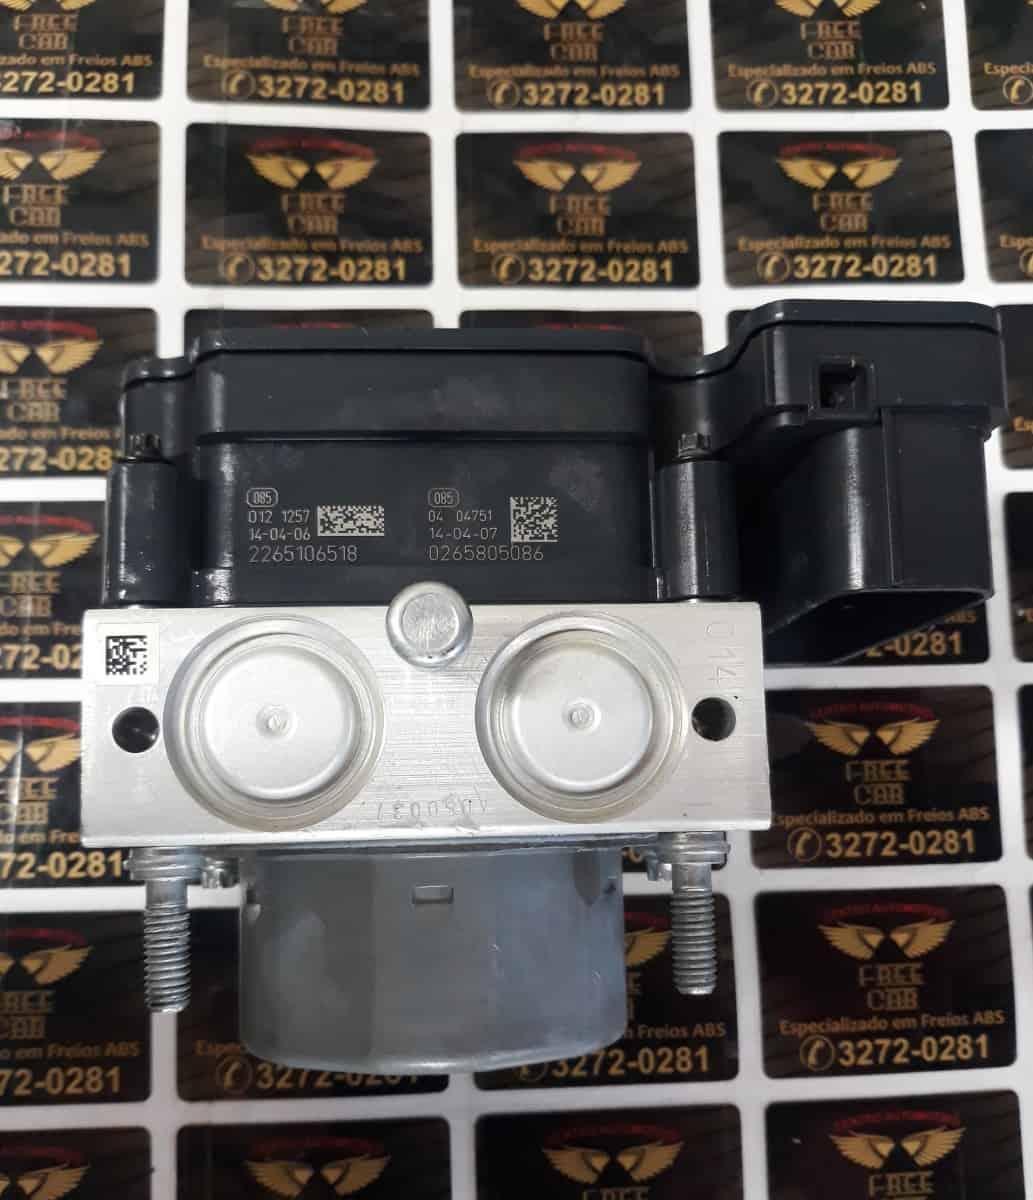 Modulo ABS Fiat 0 265 260 656 / 51943981 - Foto 3